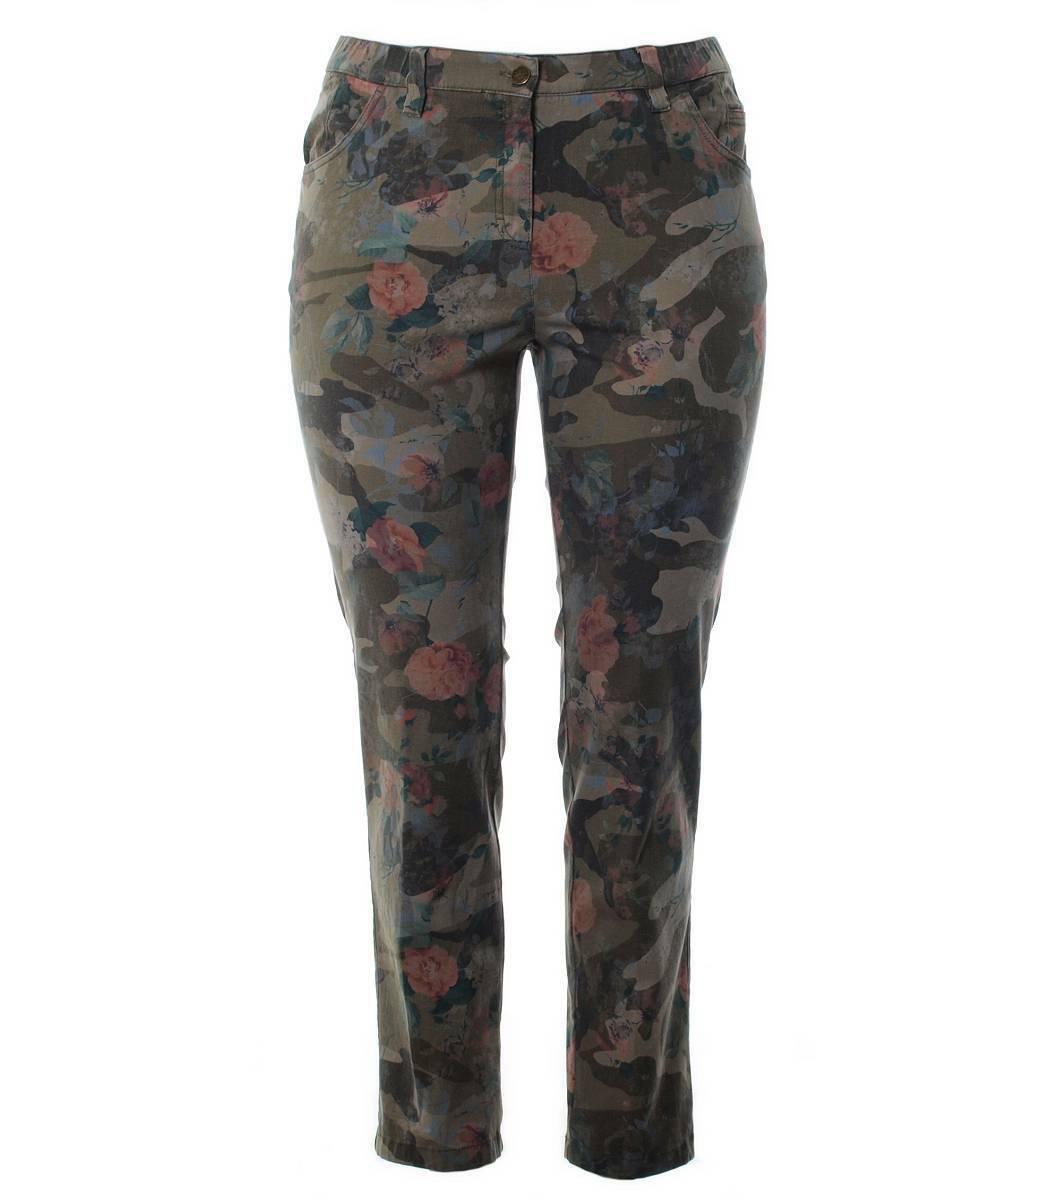 Kjbrand Kjbrand Kjbrand Jeans Donna Pantaloni Betty TUBO Tronchetti camouflage pattern grandi dimensioni 8ac0fb